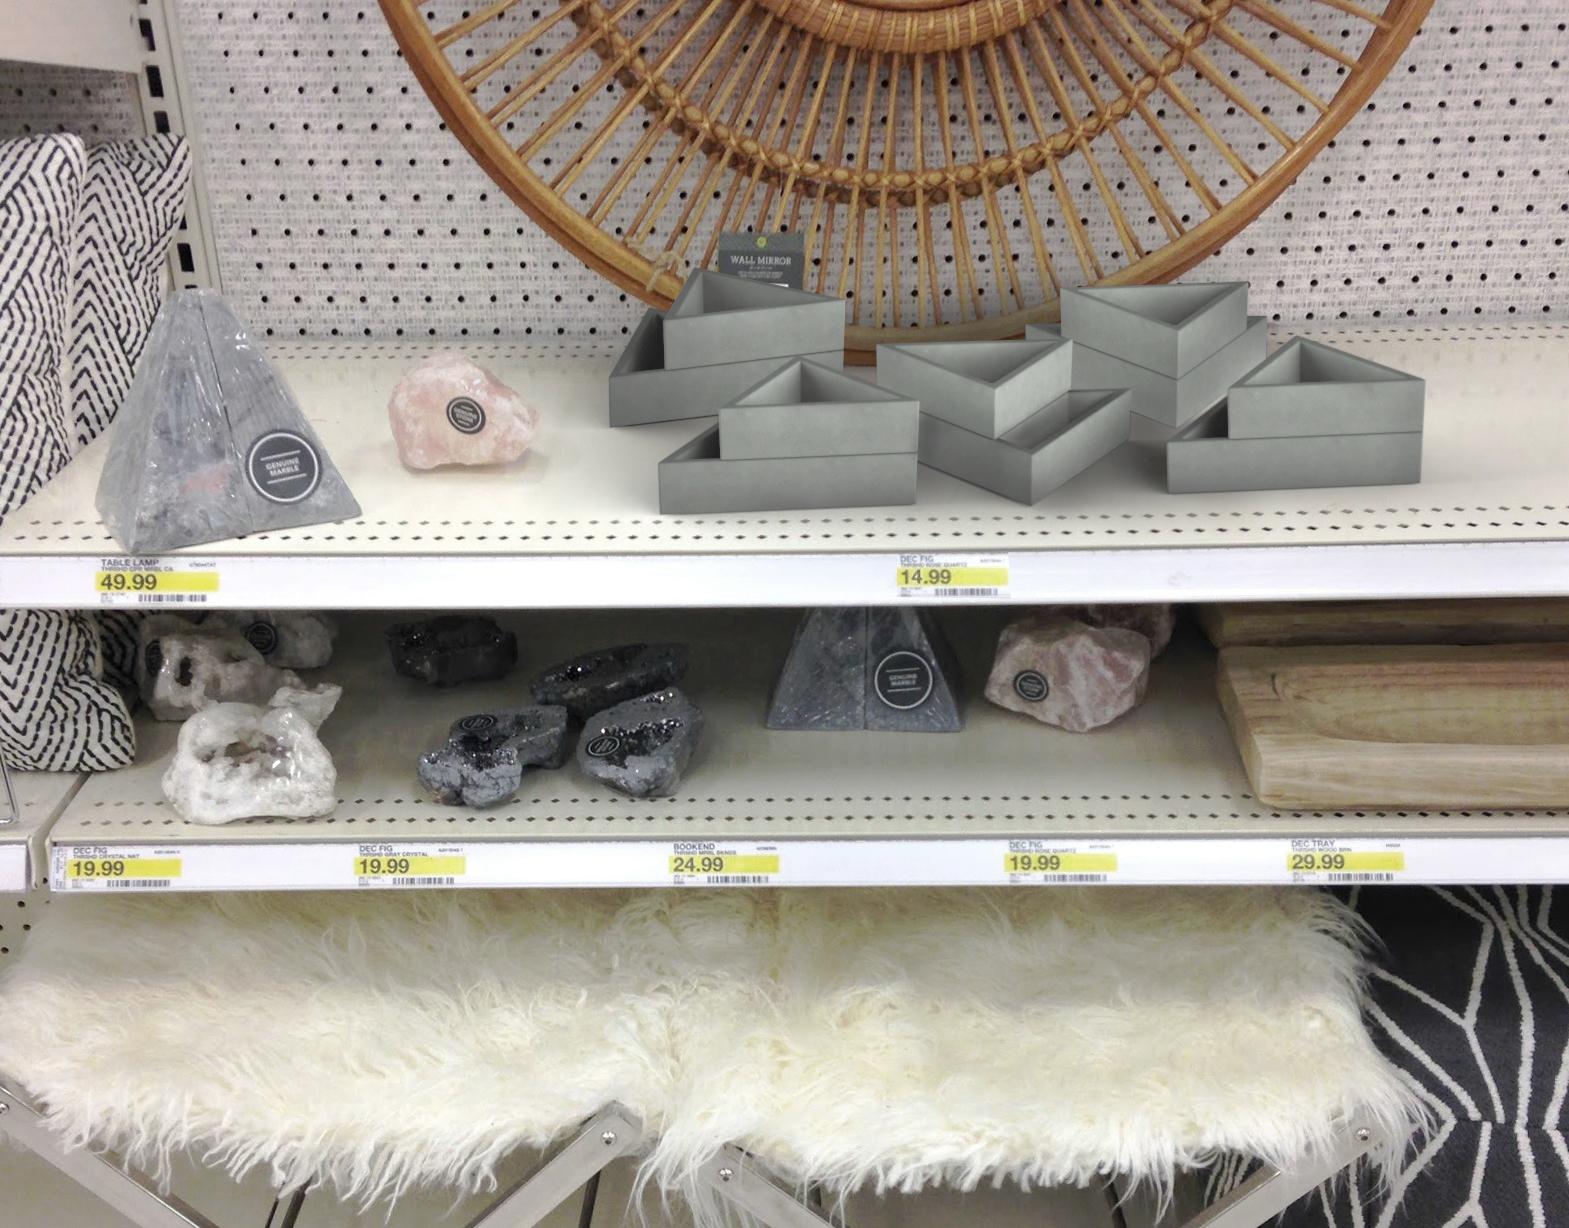 concrete storage trays aisle revised.jpg